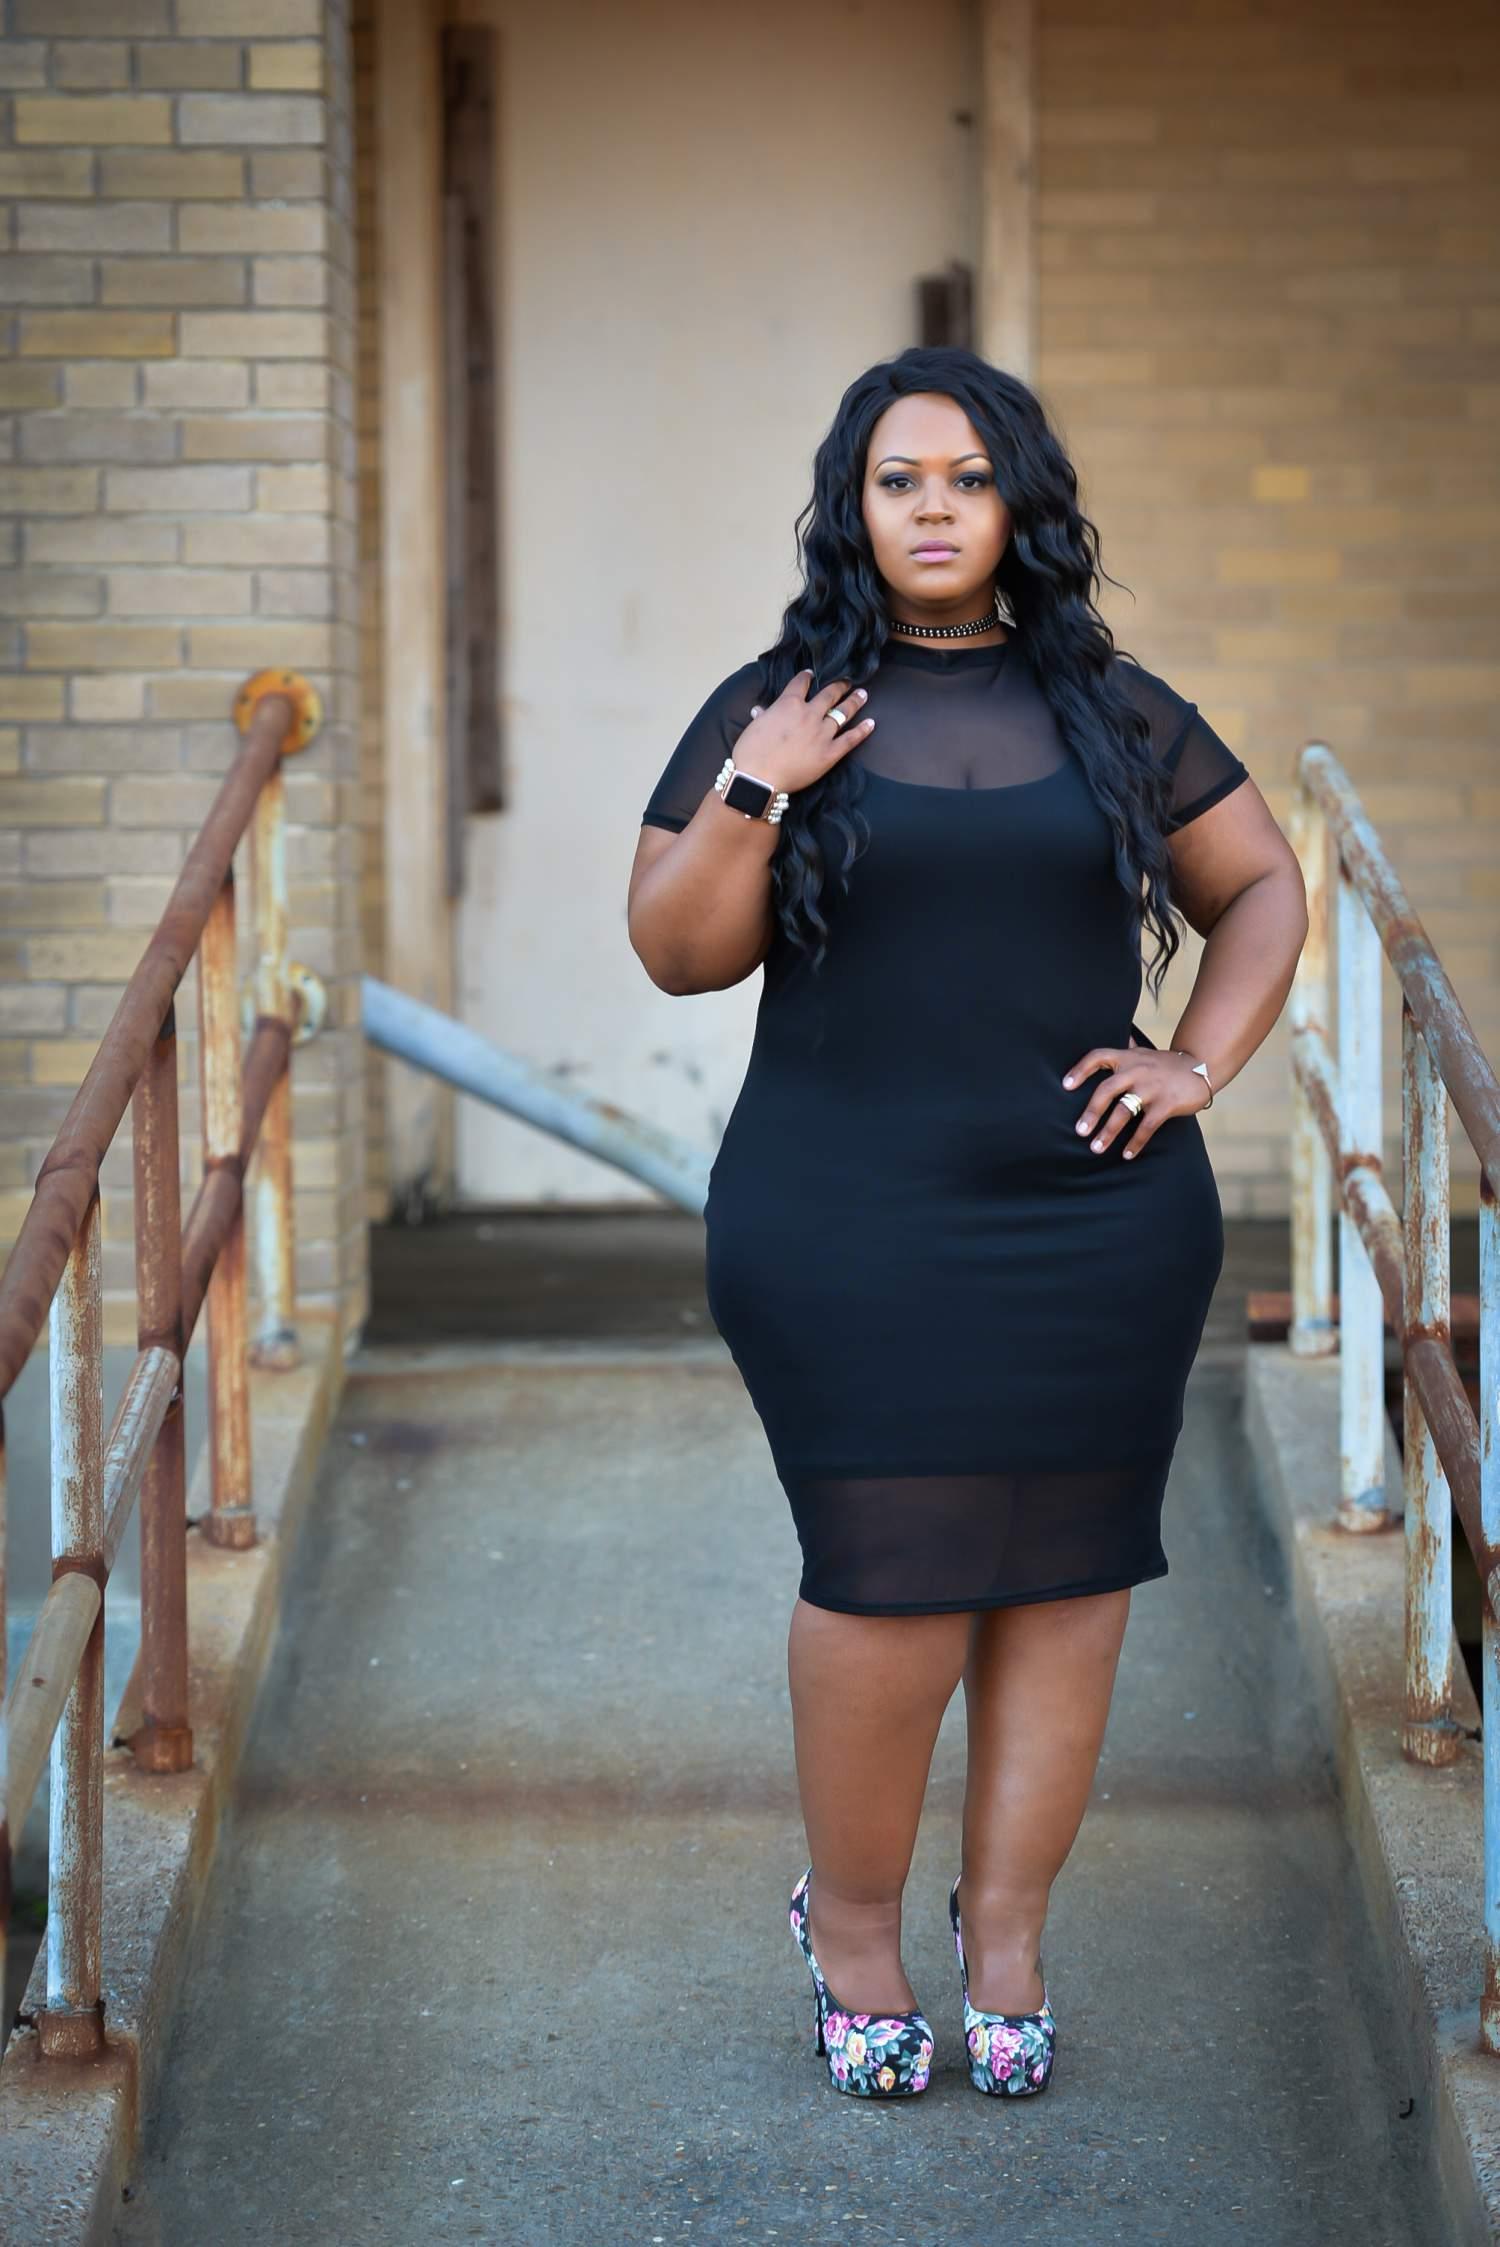 Plus Size Blogger Spotlight- Ms Be You, Do You